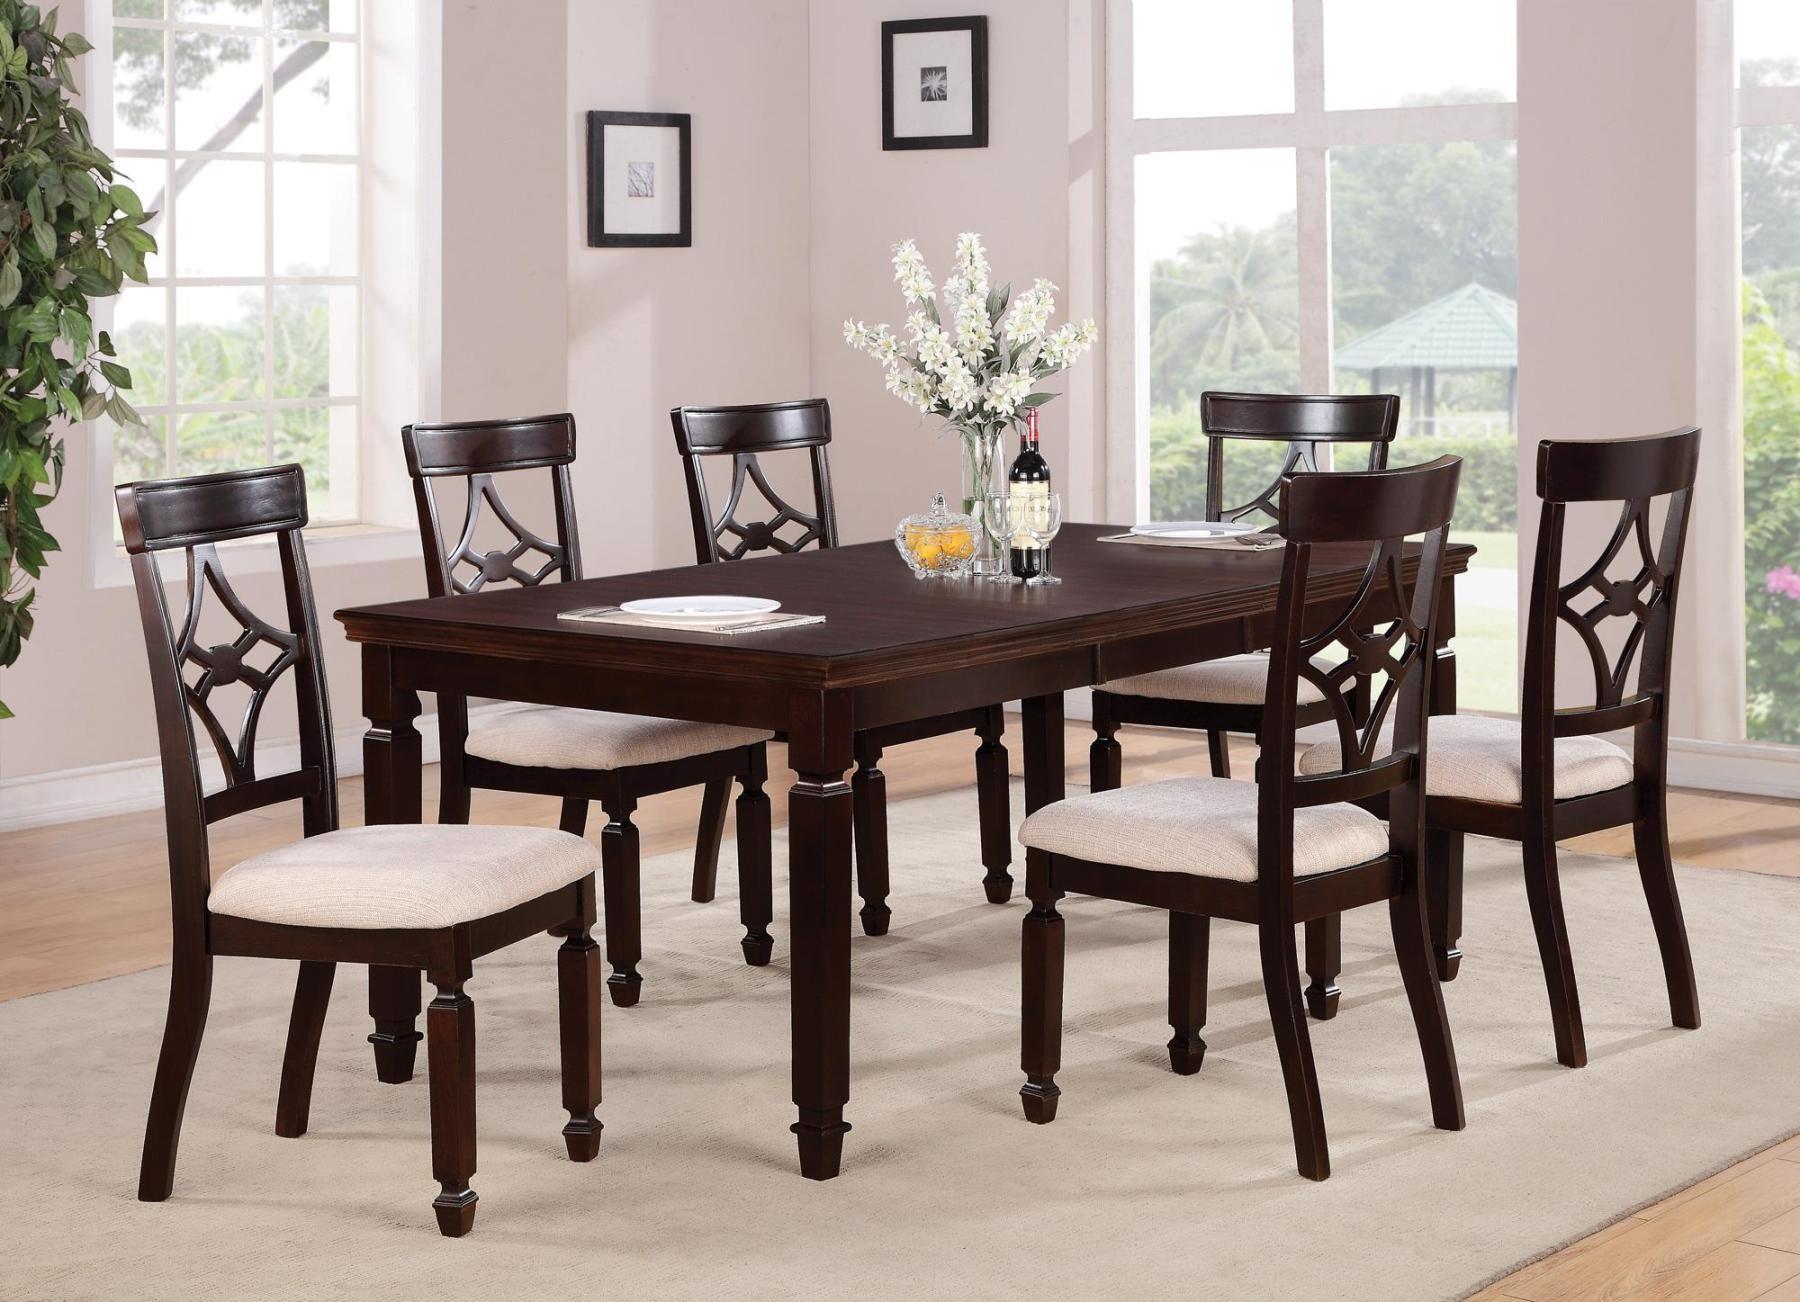 maude cherry rectangular dining room set 103631 coaster